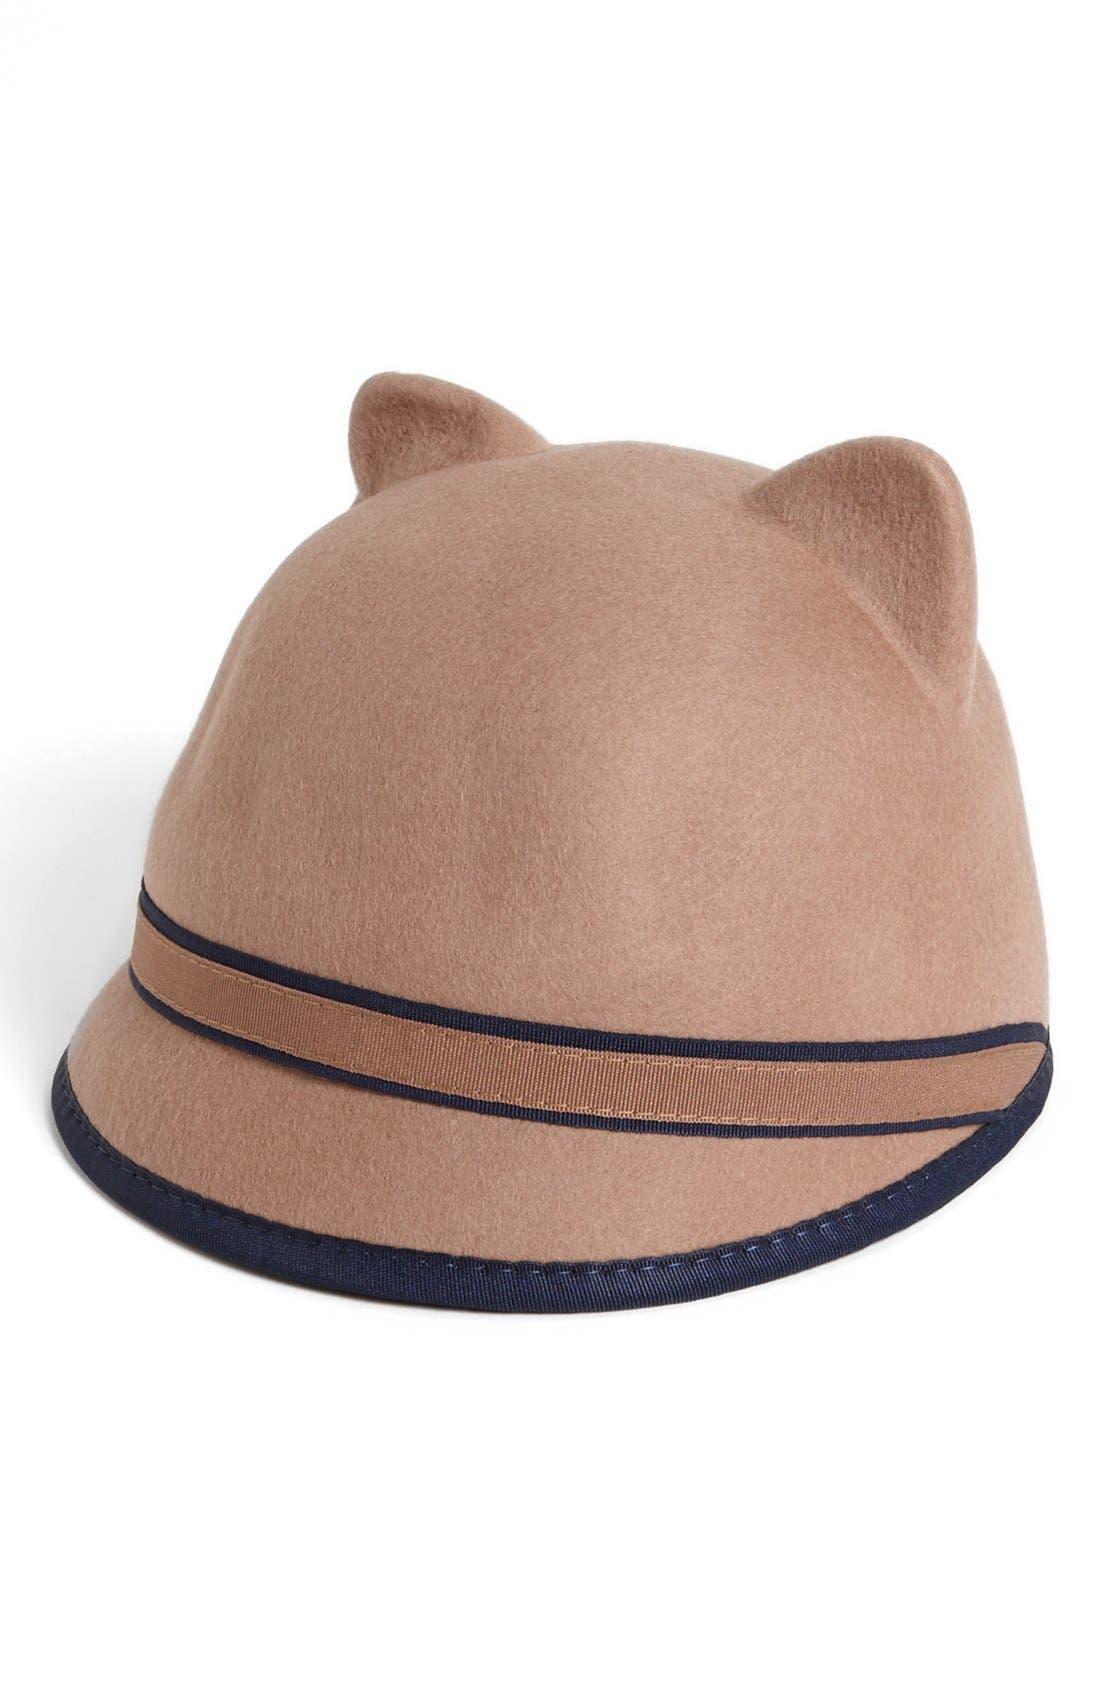 Alternate Image 1 Selected - BCBGMAXAZRIA Kitty Cat Baseball Cap